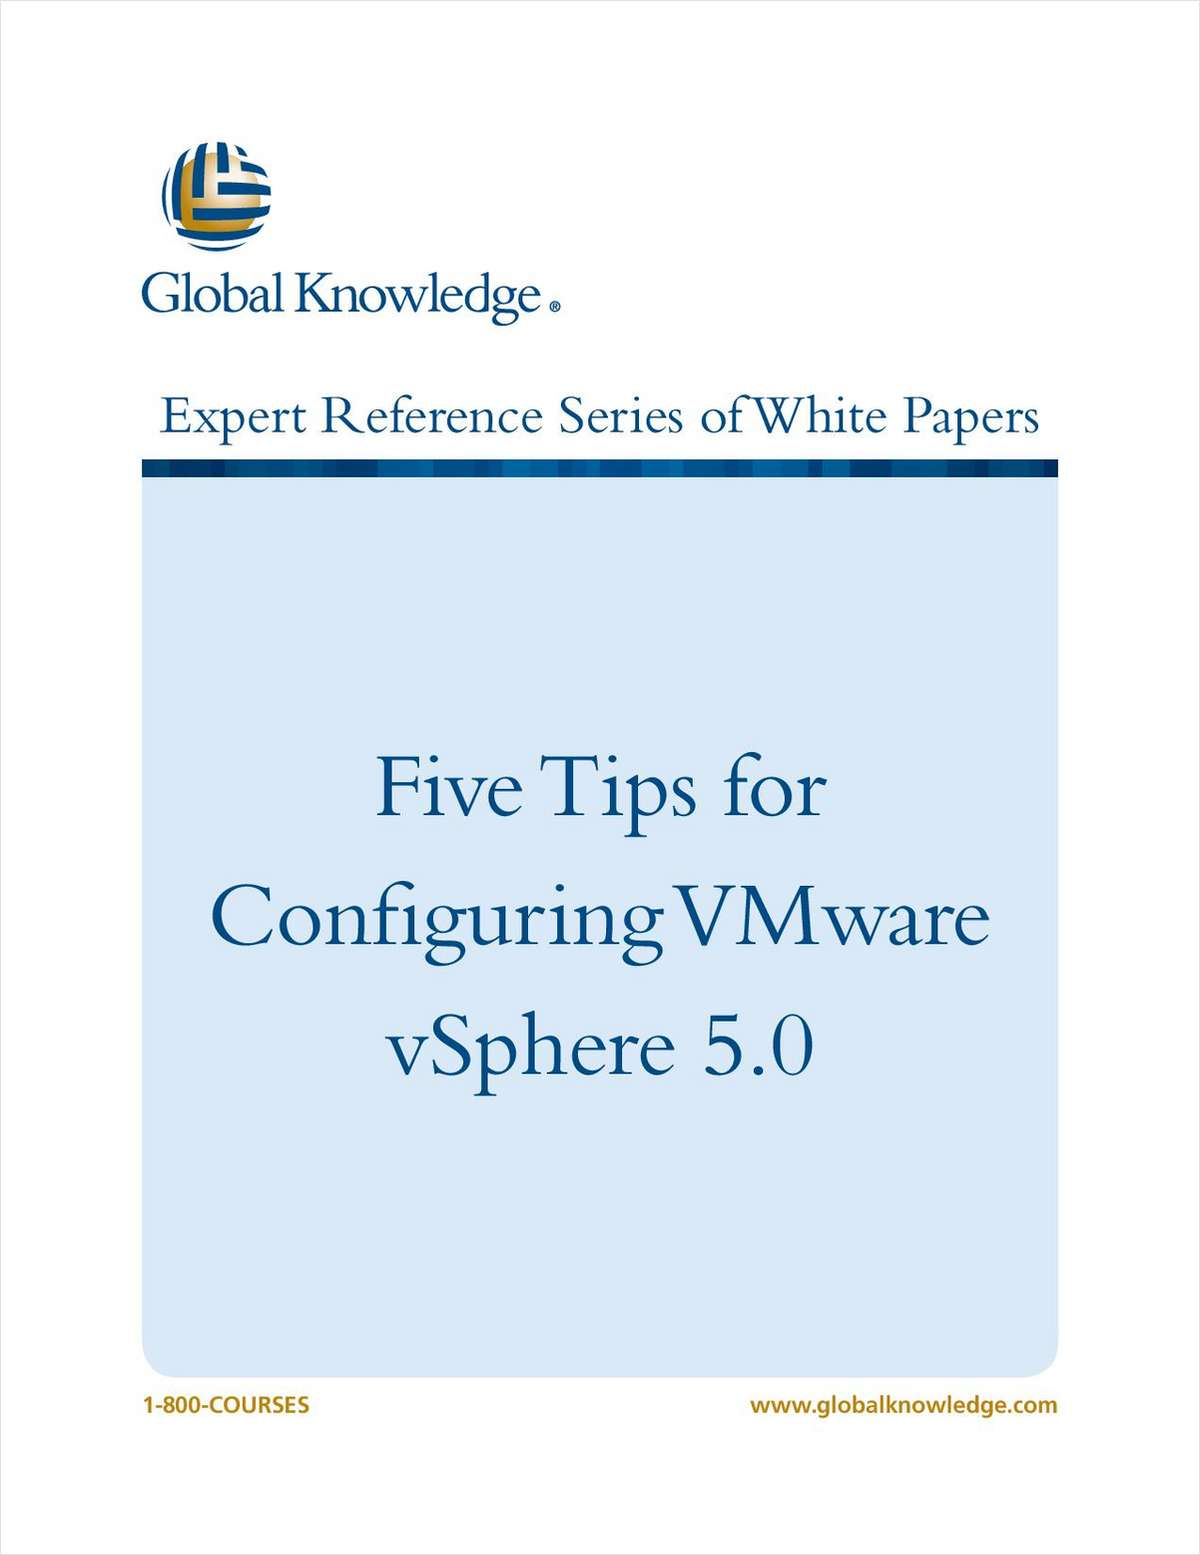 Five Tips for Configuring VMware vSphere 5.0